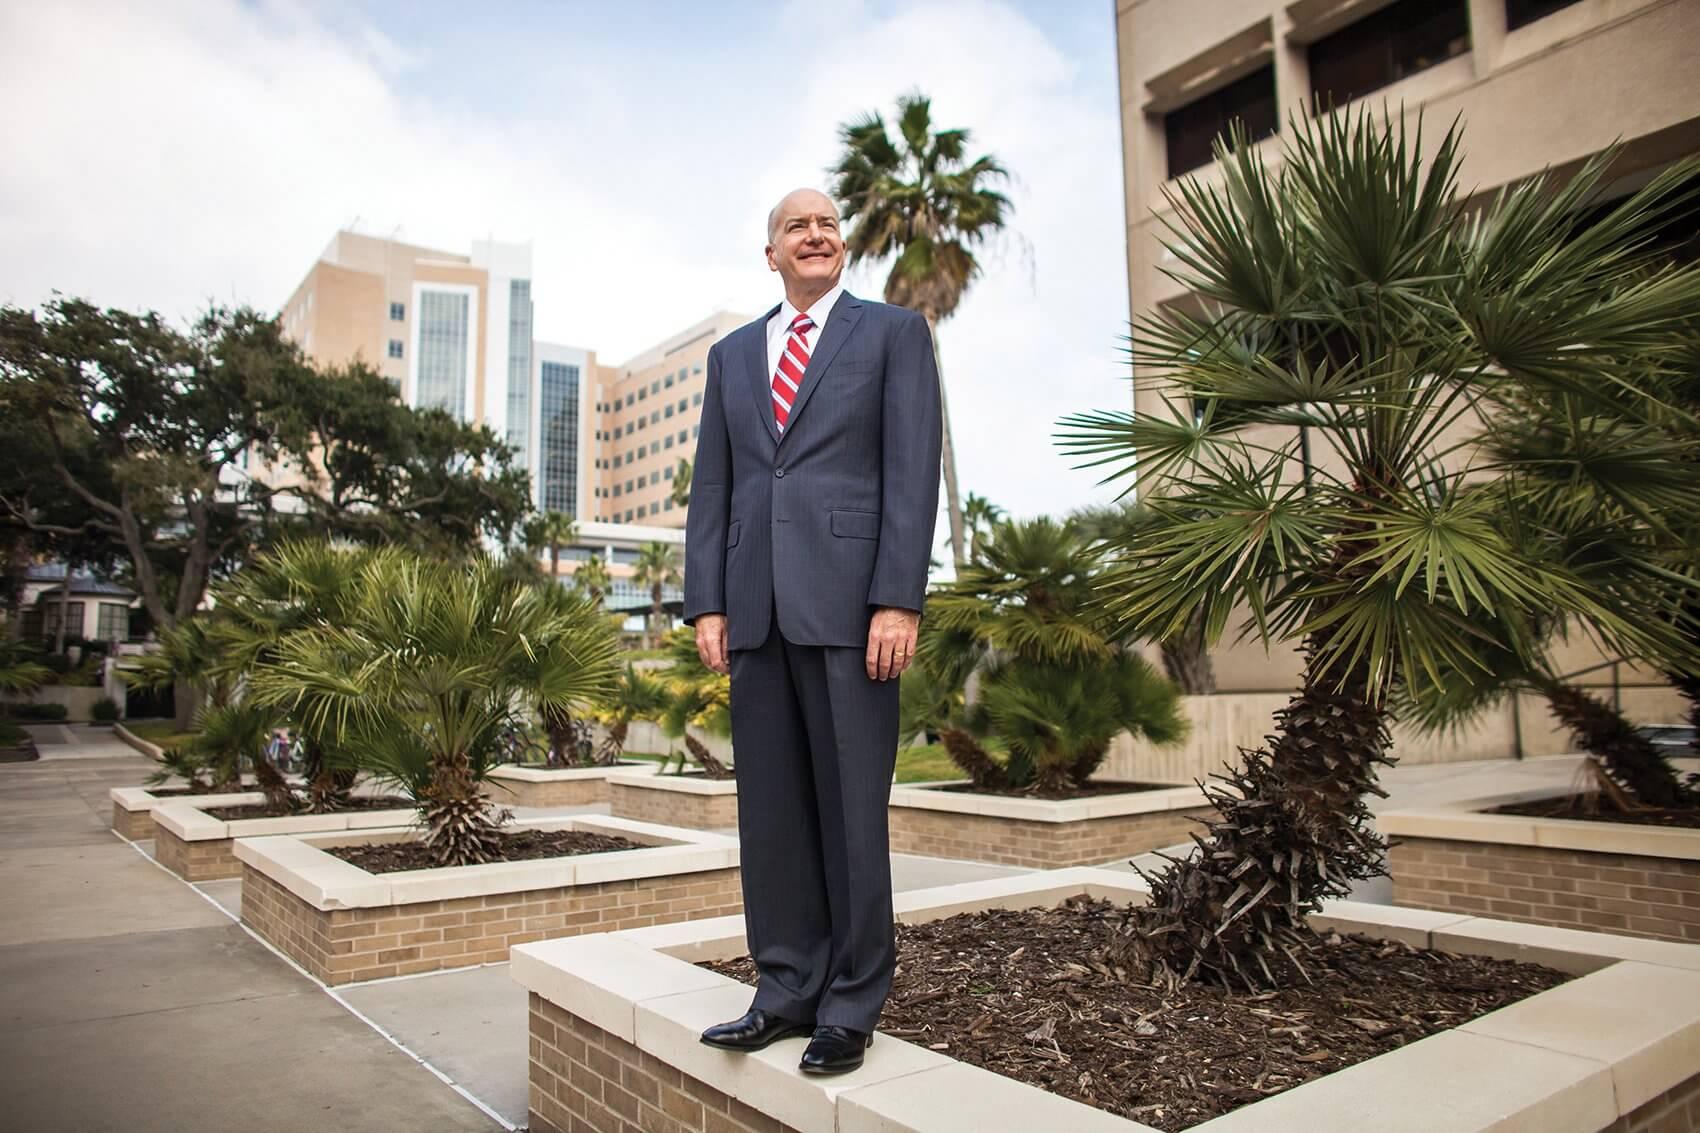 David L. Callender, M.D., president of The University of Texas Medical Branch at Galveston